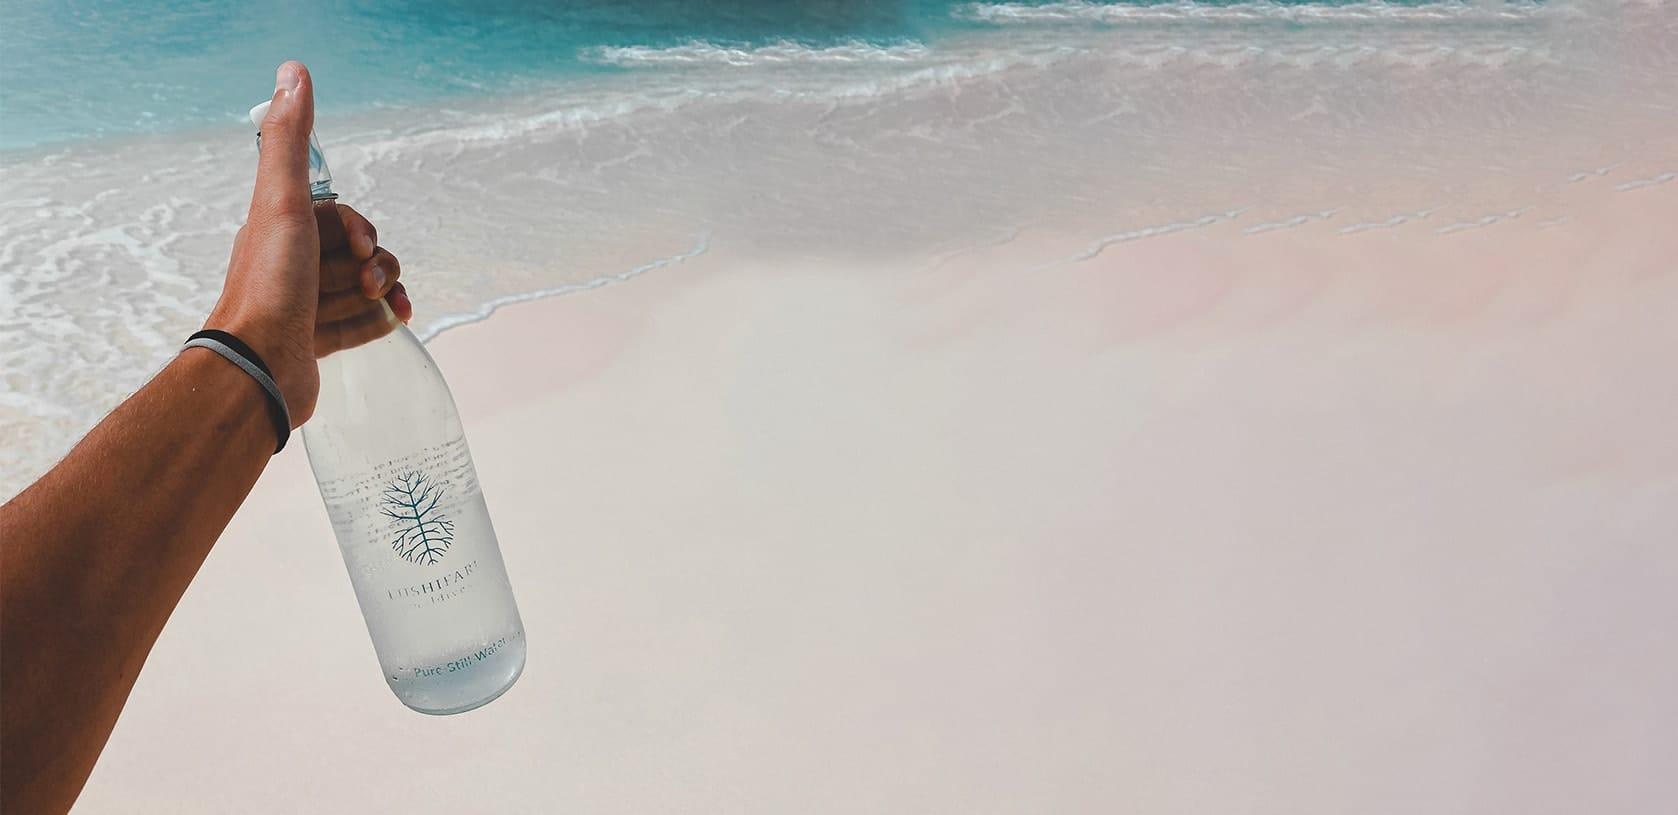 Reusable custom water bottles provided by Fushifaru